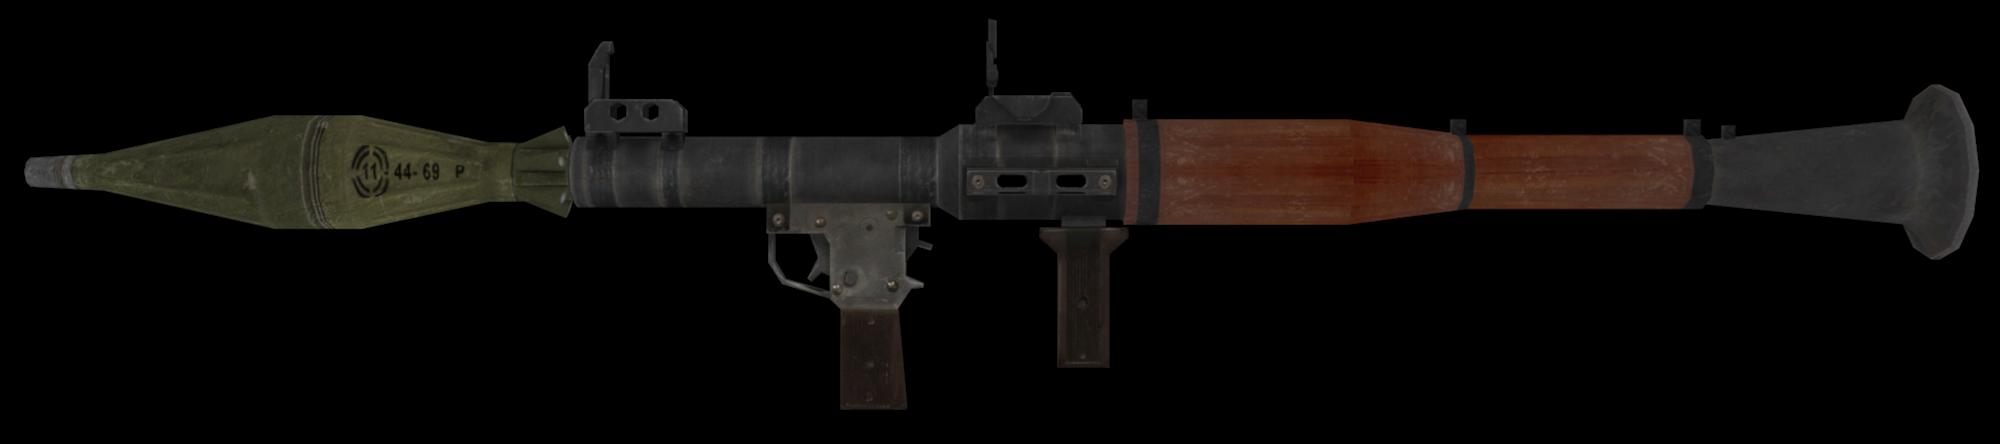 RPG PNG